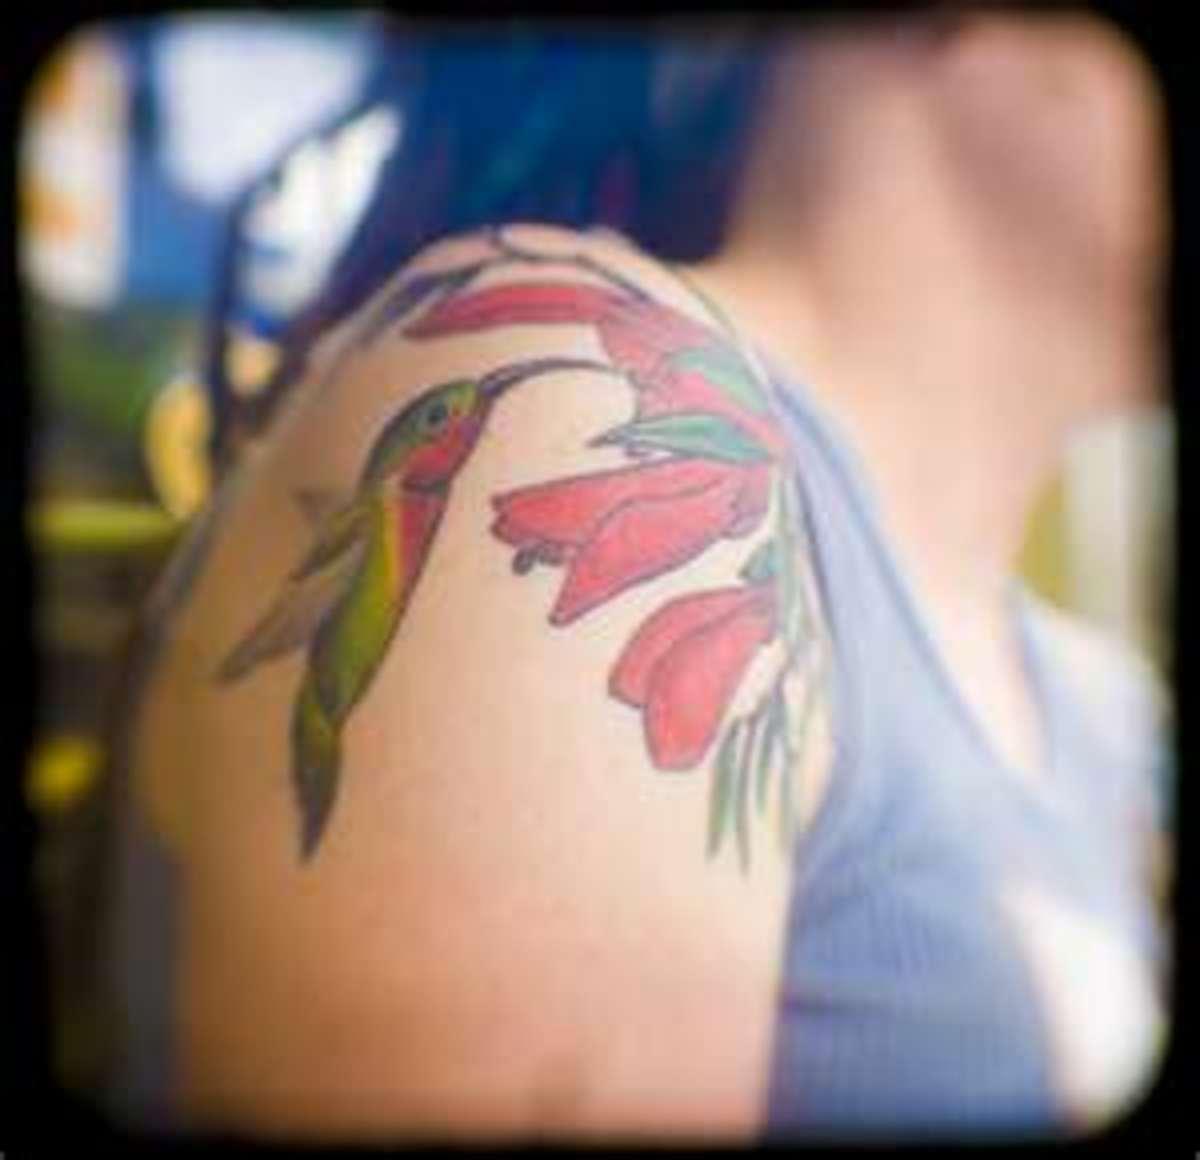 hummingbirdtattoodesignsgalleryphotospictures